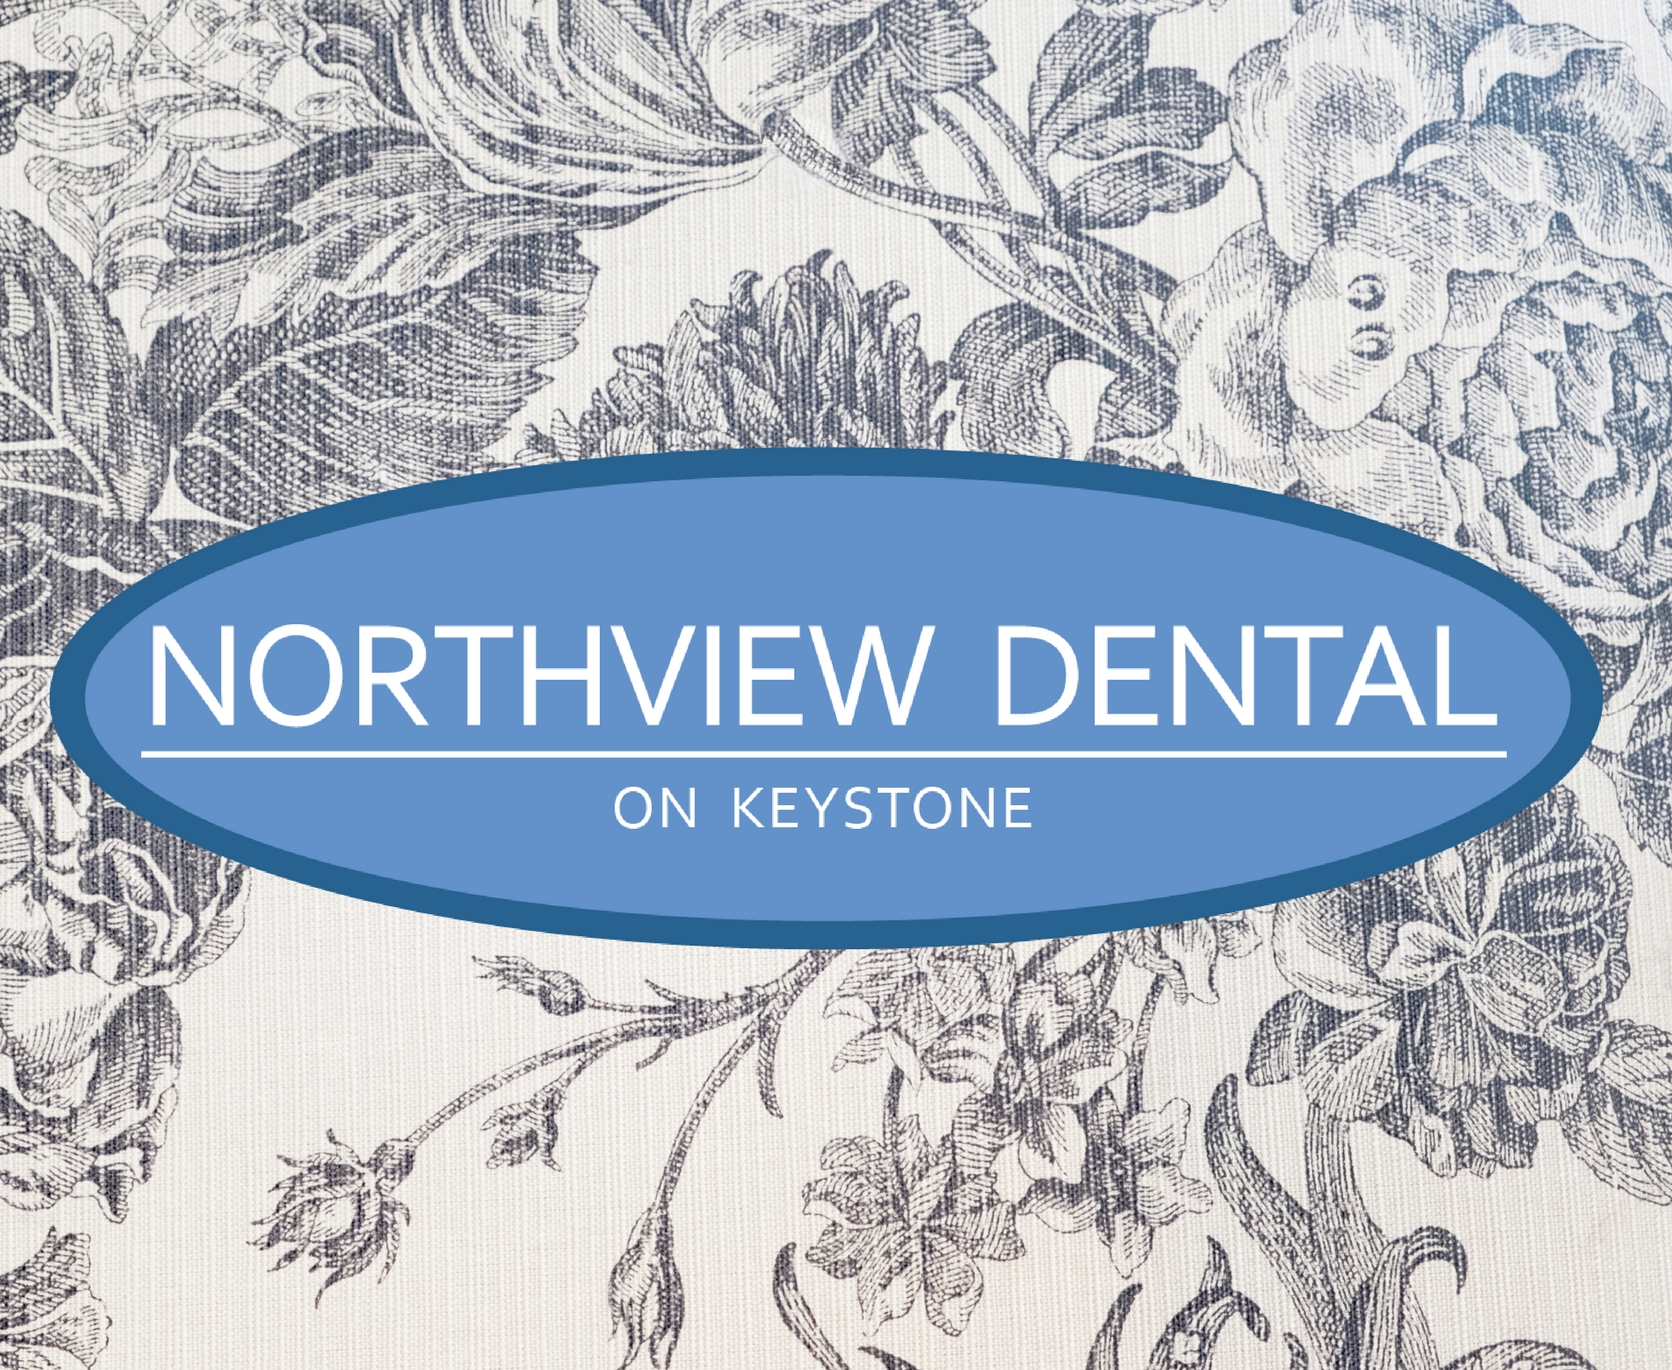 northview dental on keystone of indy